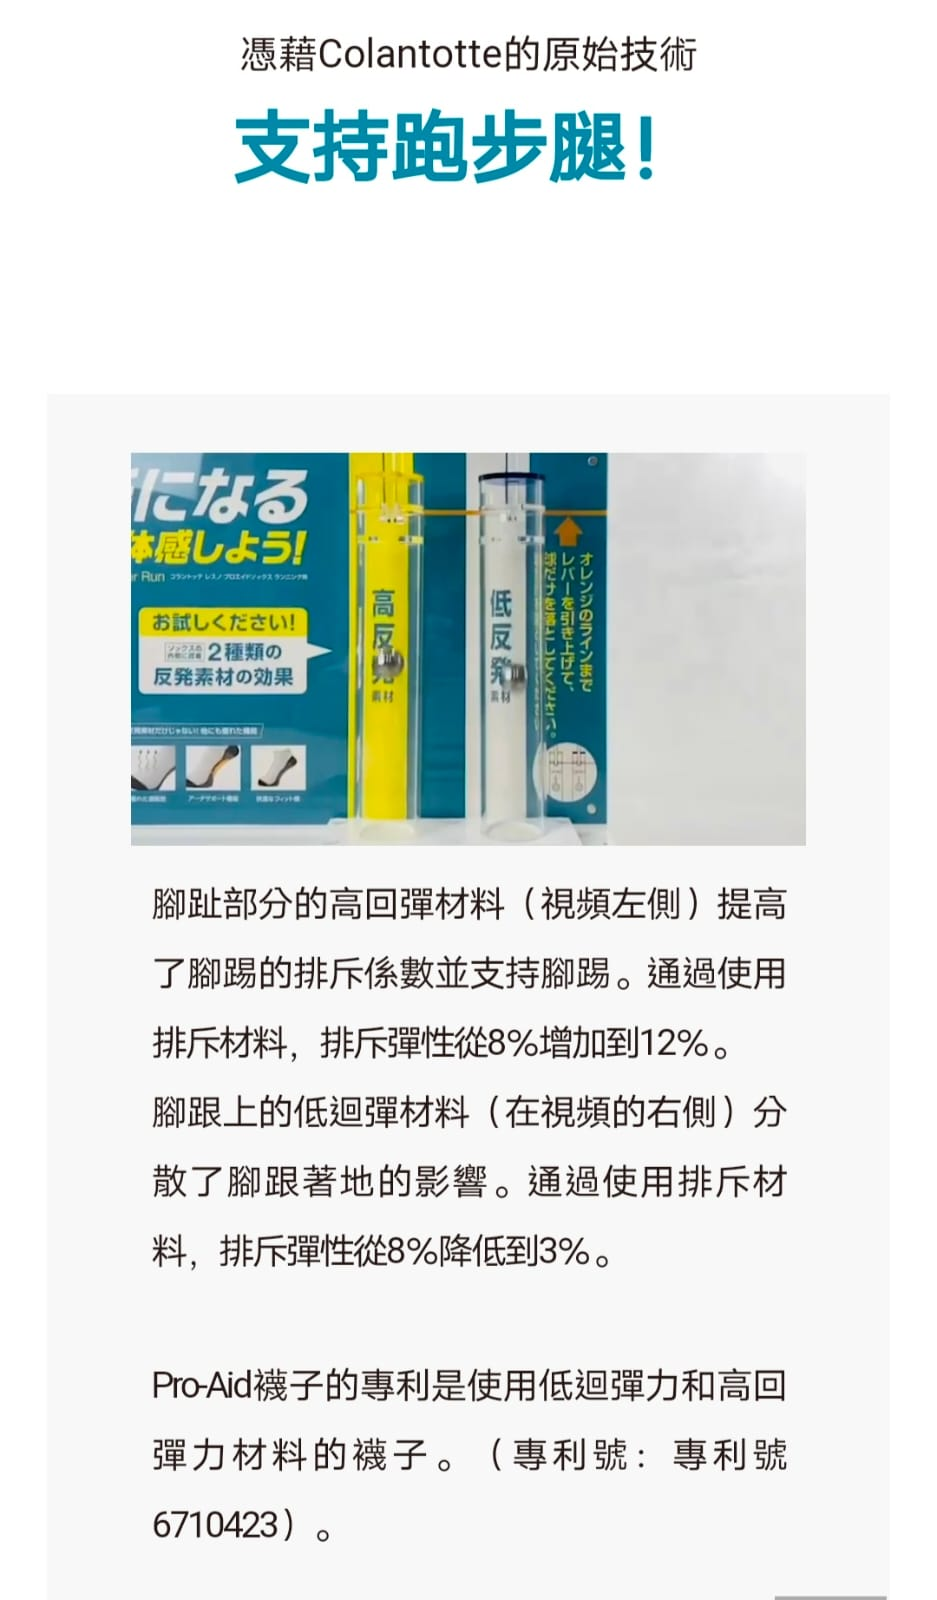 db37bbc4-8a77-4f41-810c-4d64960b0362.jpg